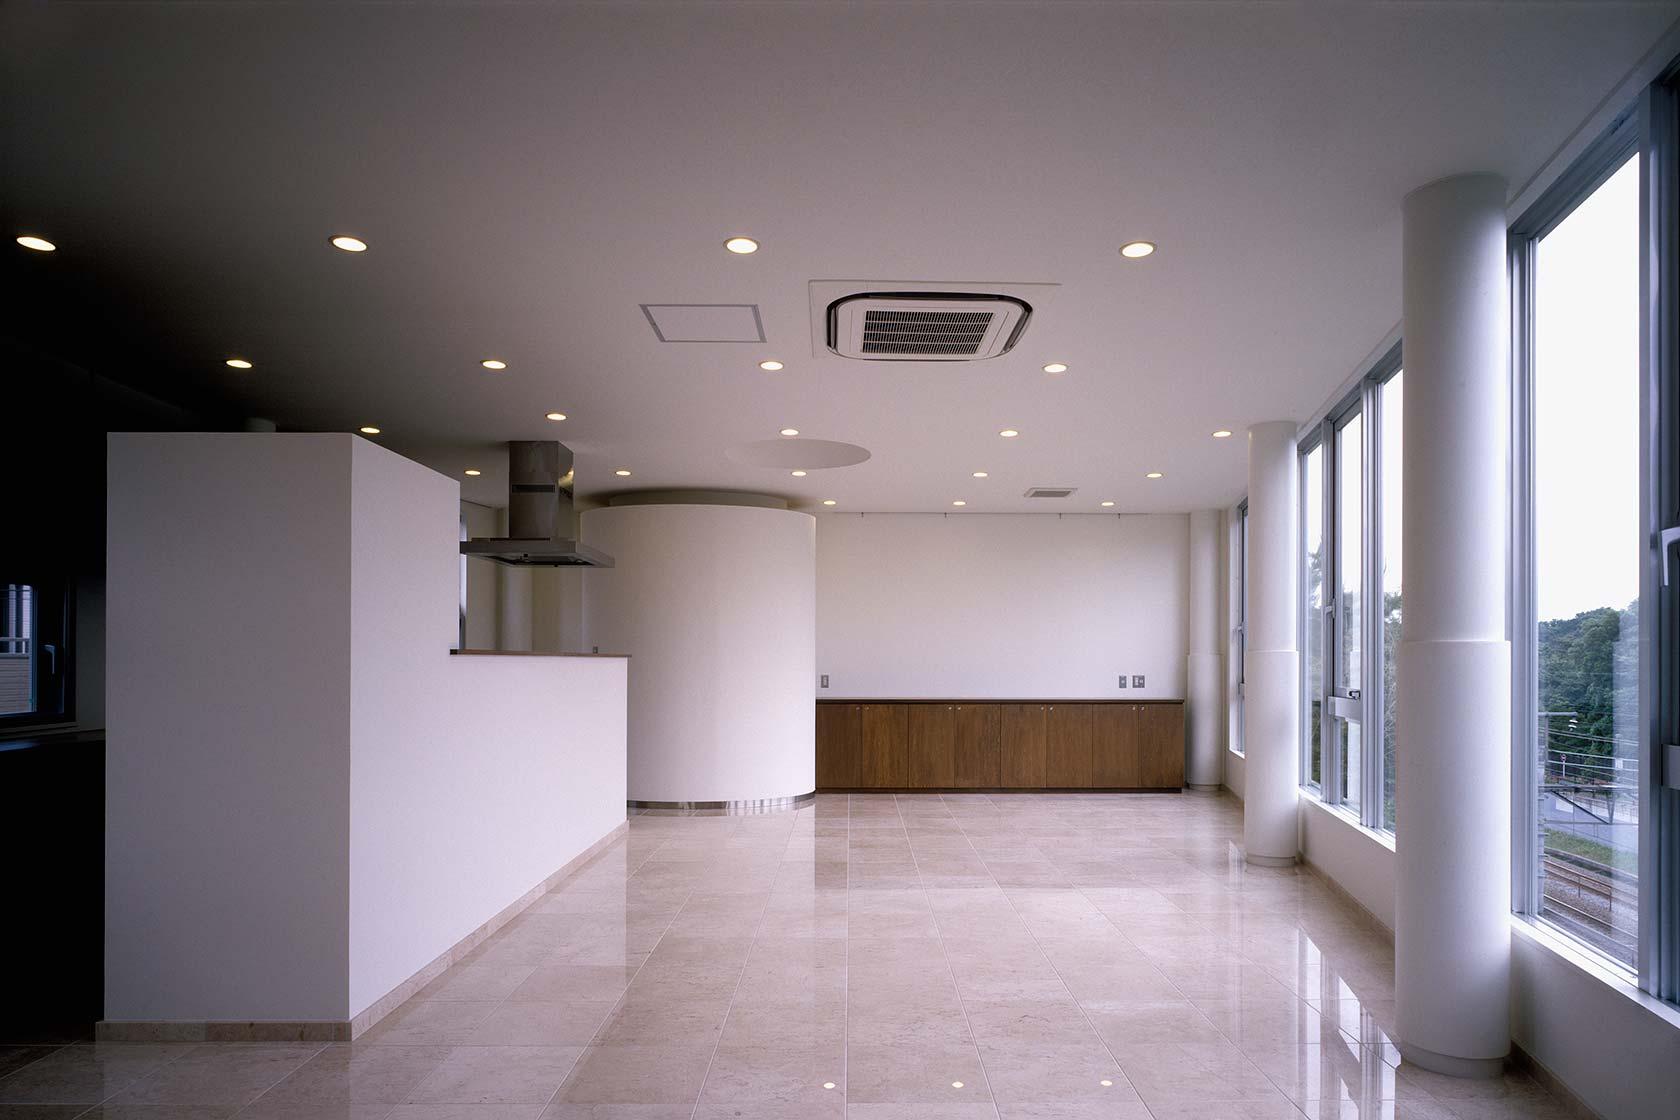 officeT6-階段側から打合せ室を見る